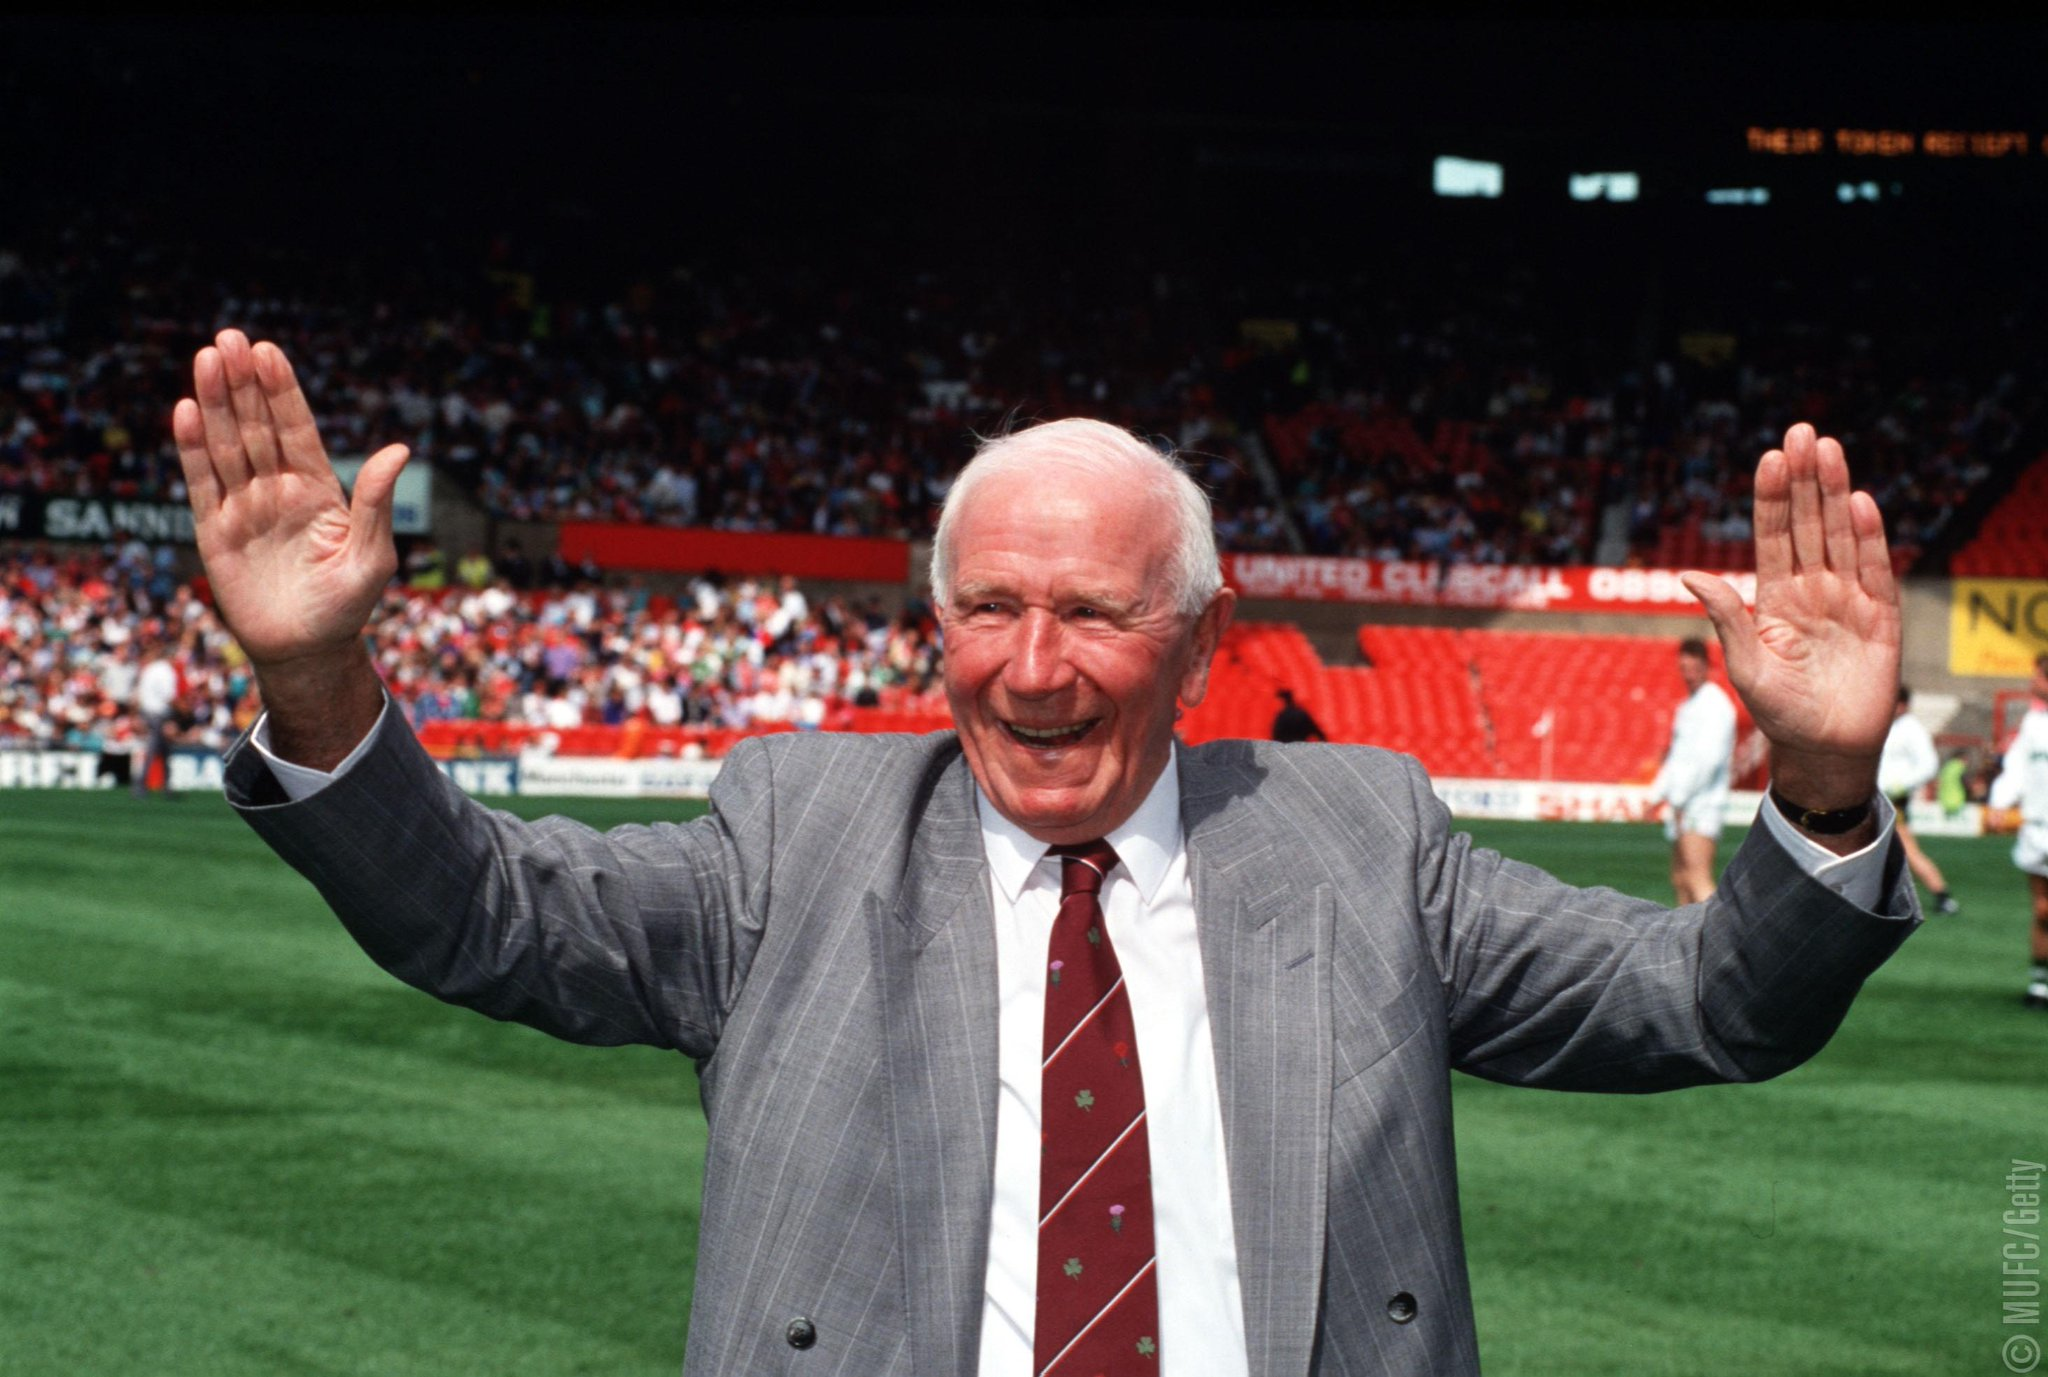 Today marks 24 years since Sir Matt Busby passed away. A true #MUFC legend. https://t.co/8k165u9HhF